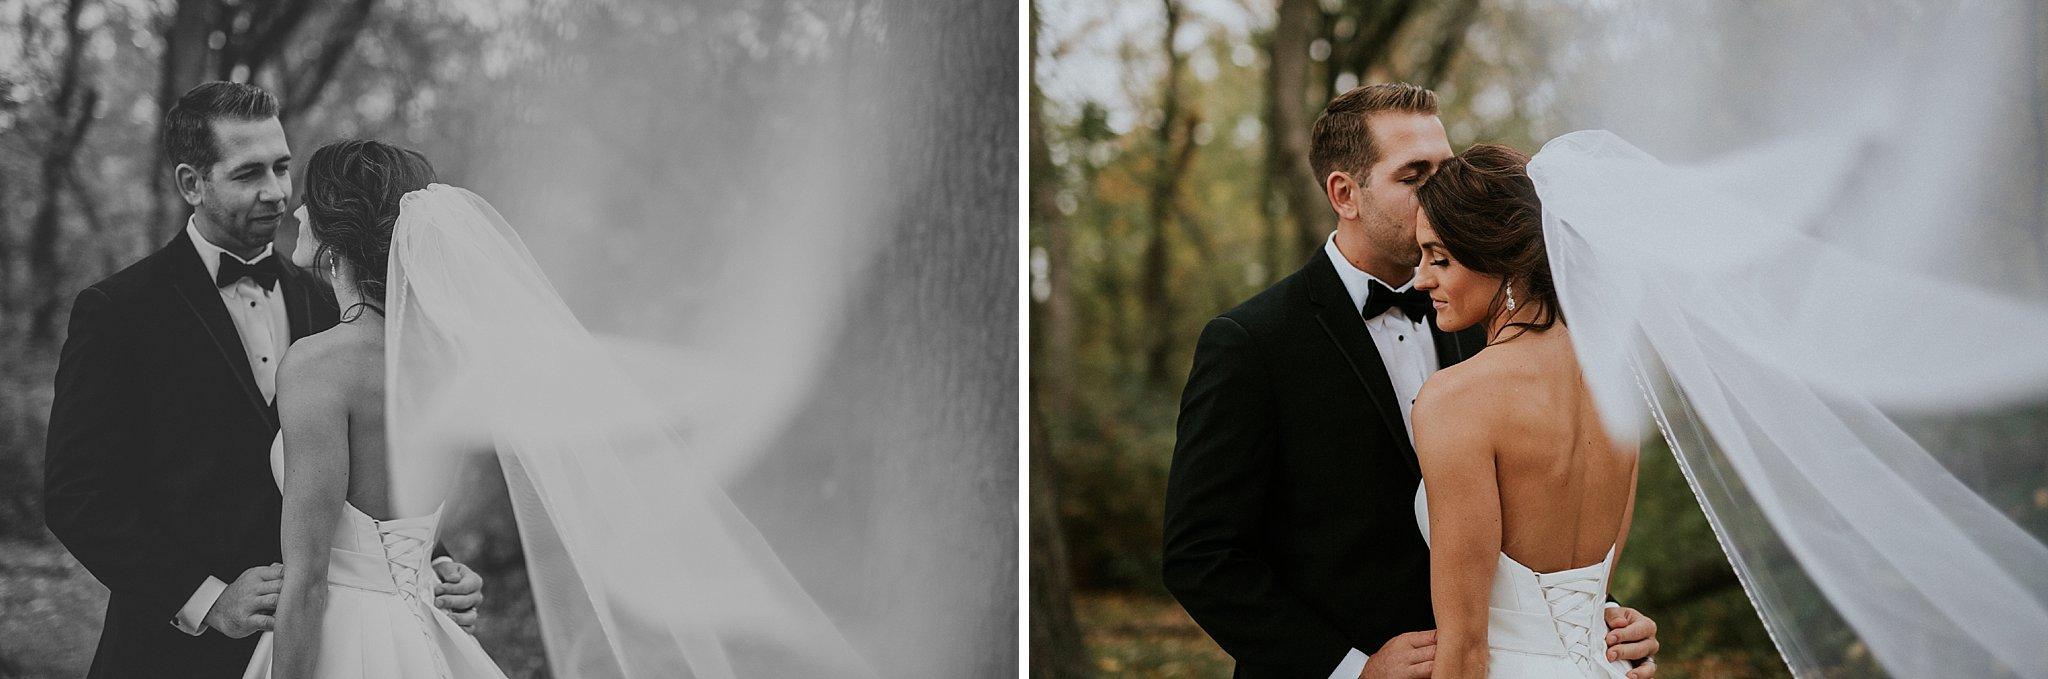 Matt-Lauren_St-Marys_Hilton-City-Center-Milwaukee-Wedding_liller-photo_0048.jpg